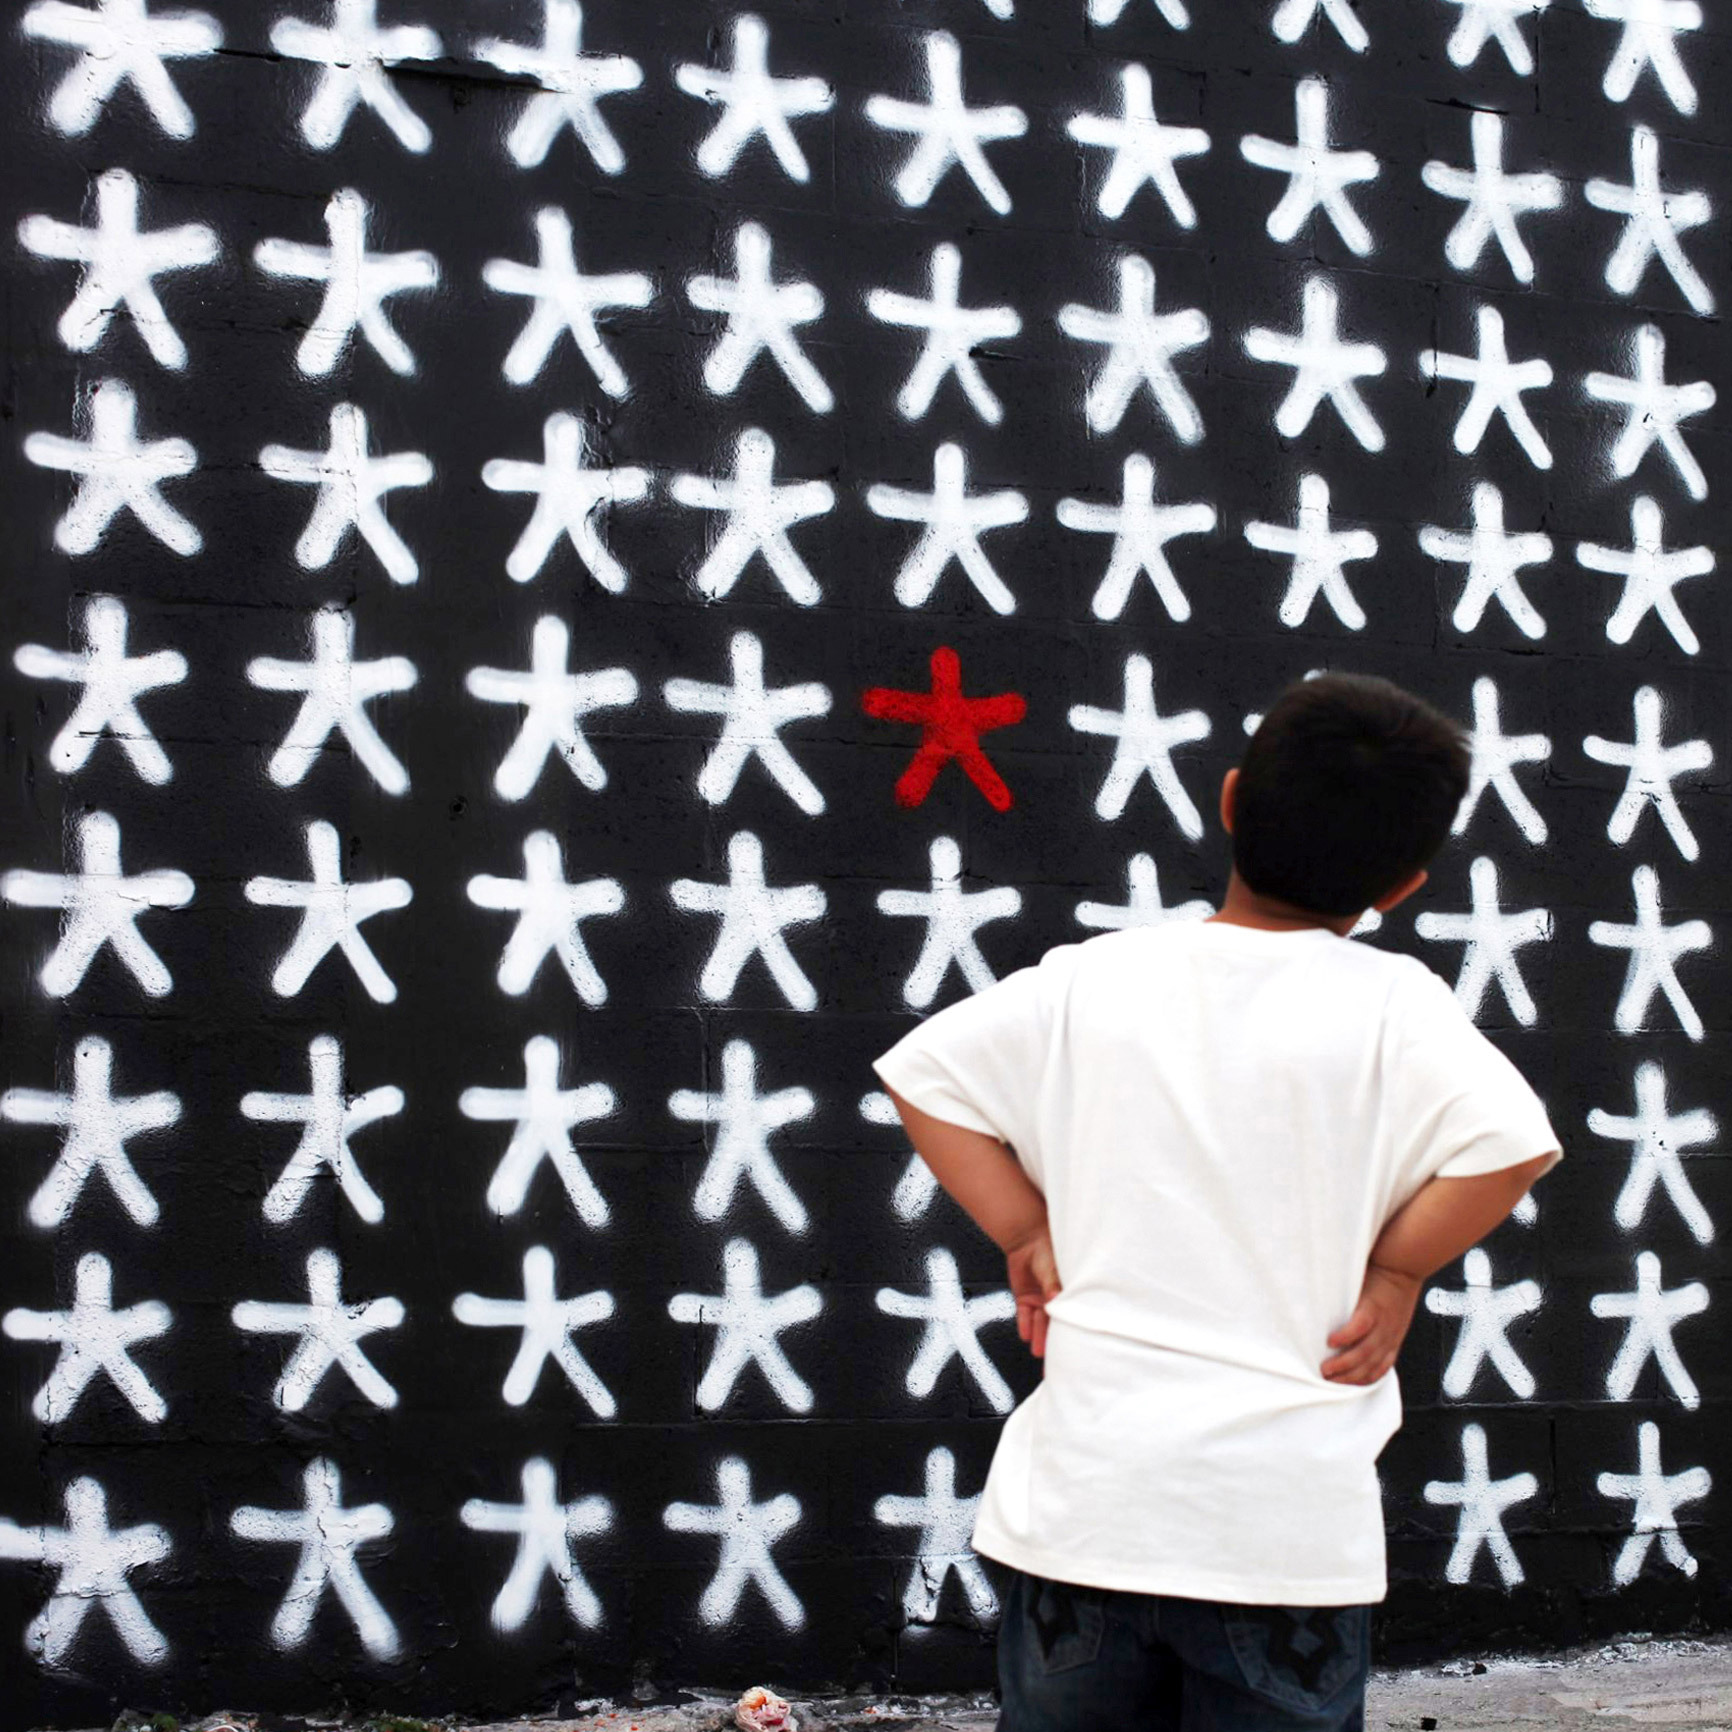 Eric Haze Graffuturism Art Basel Miami